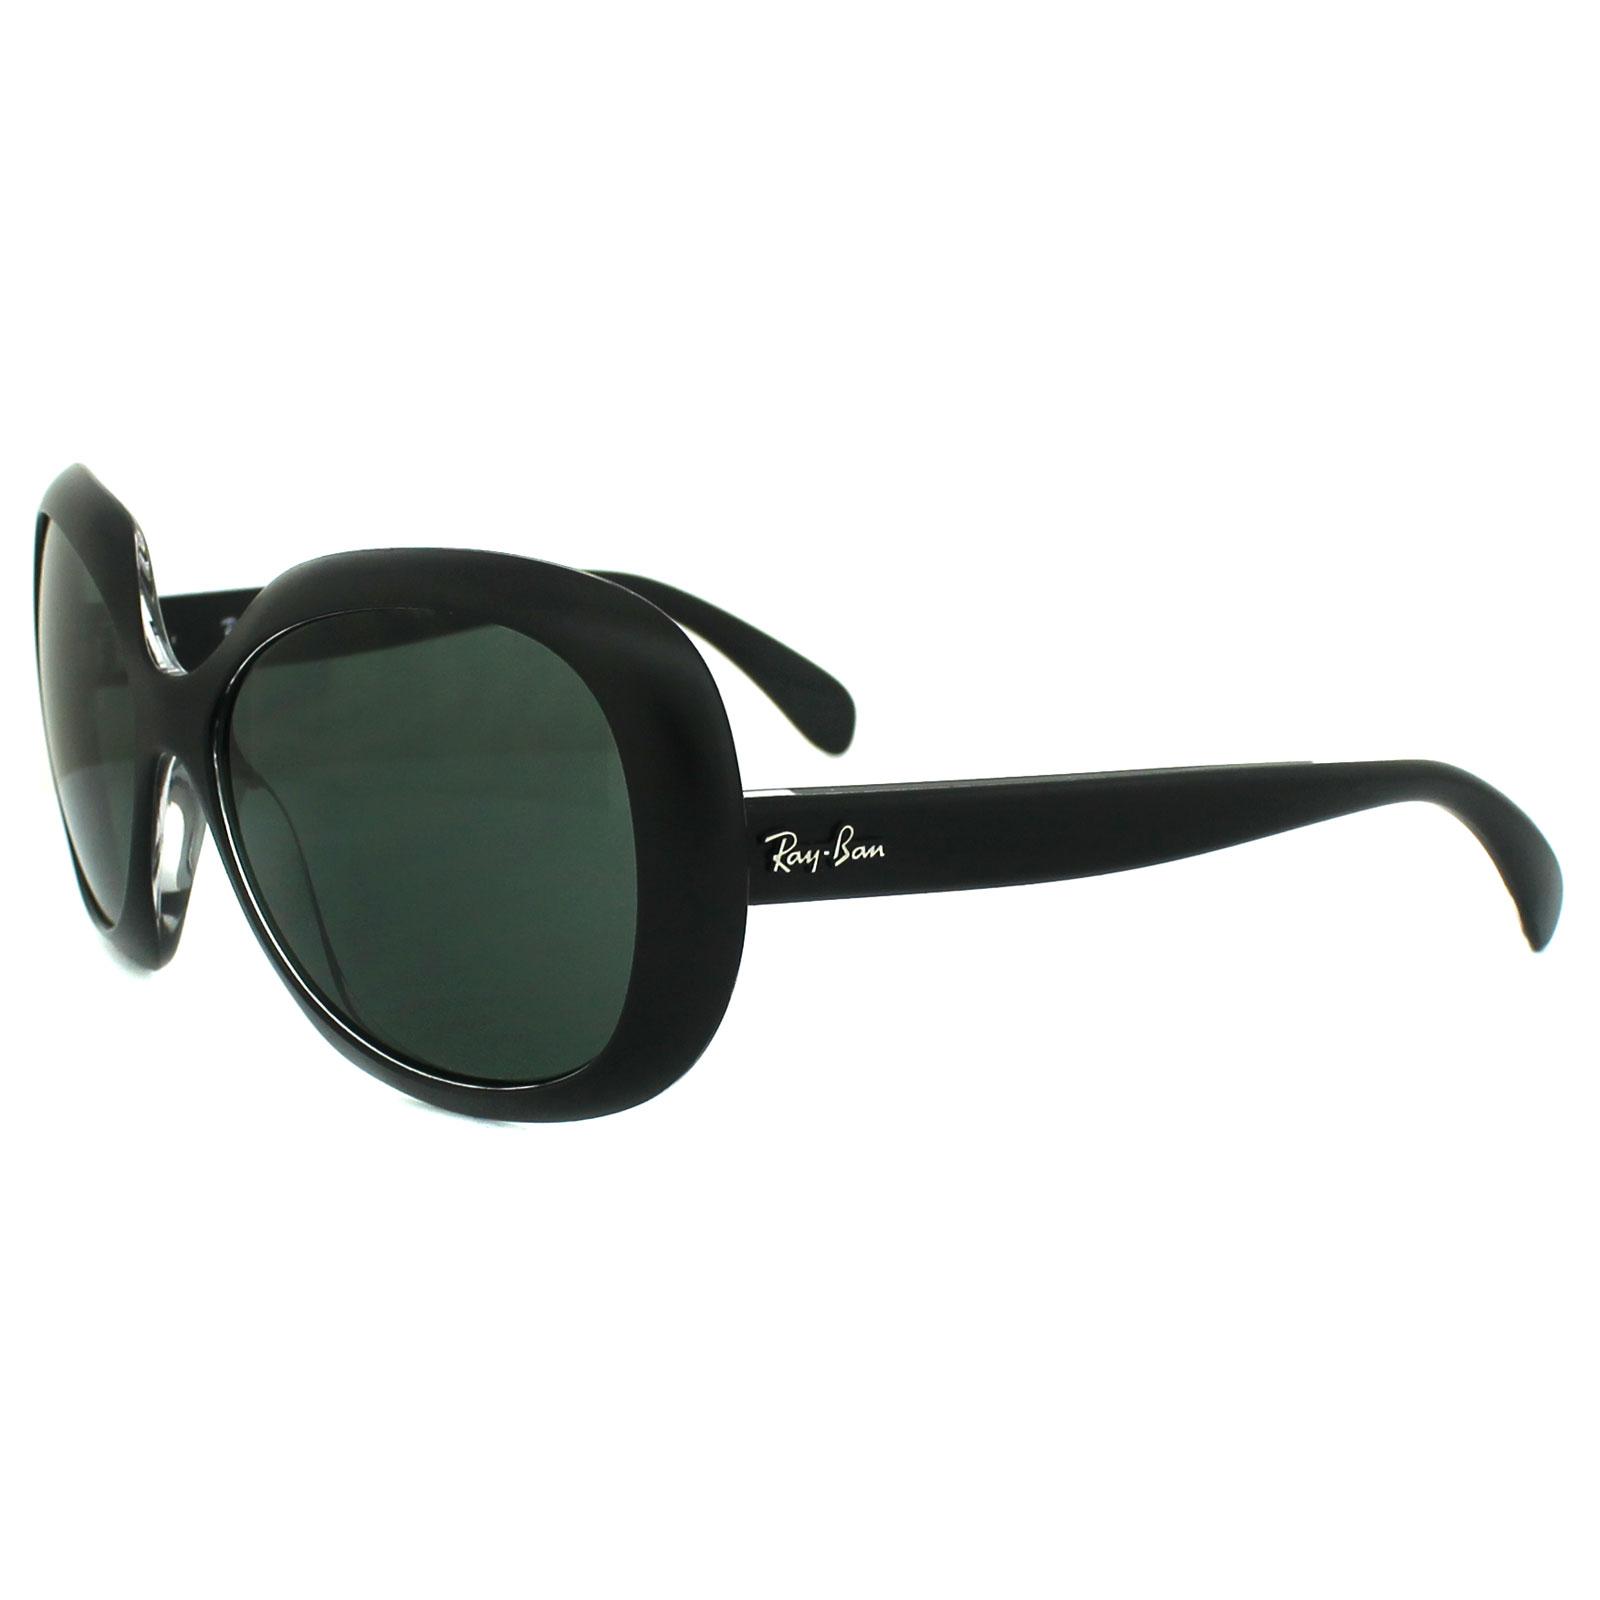 ec975bef66a2 Buying Ray Ban On Ebay. Jun20. Elderly friends. Best Buy On Ray Ban Sunglasses  Ebay